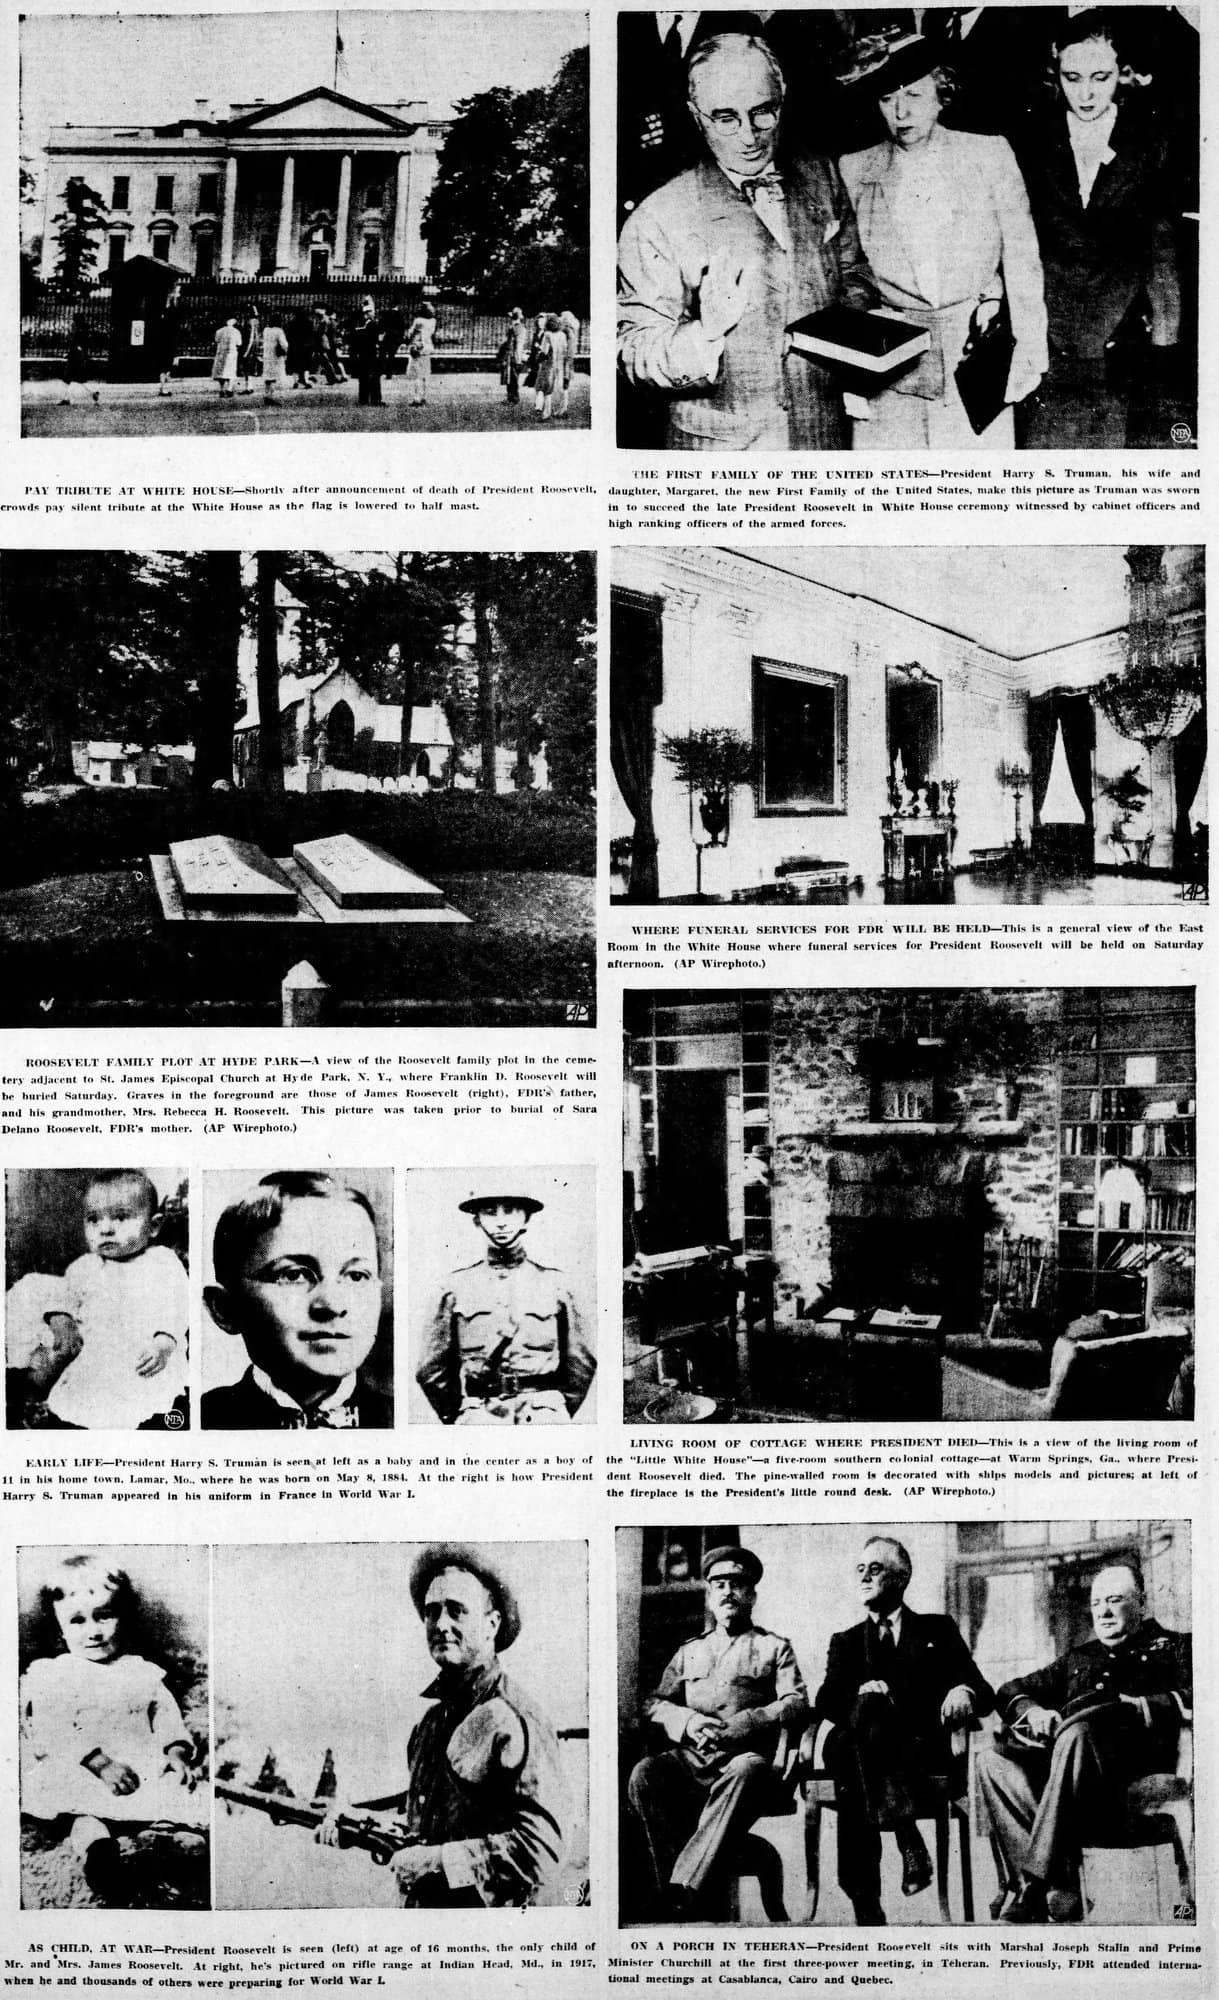 Looking back at Franklin Delano Roosevelt's presidency (1945)